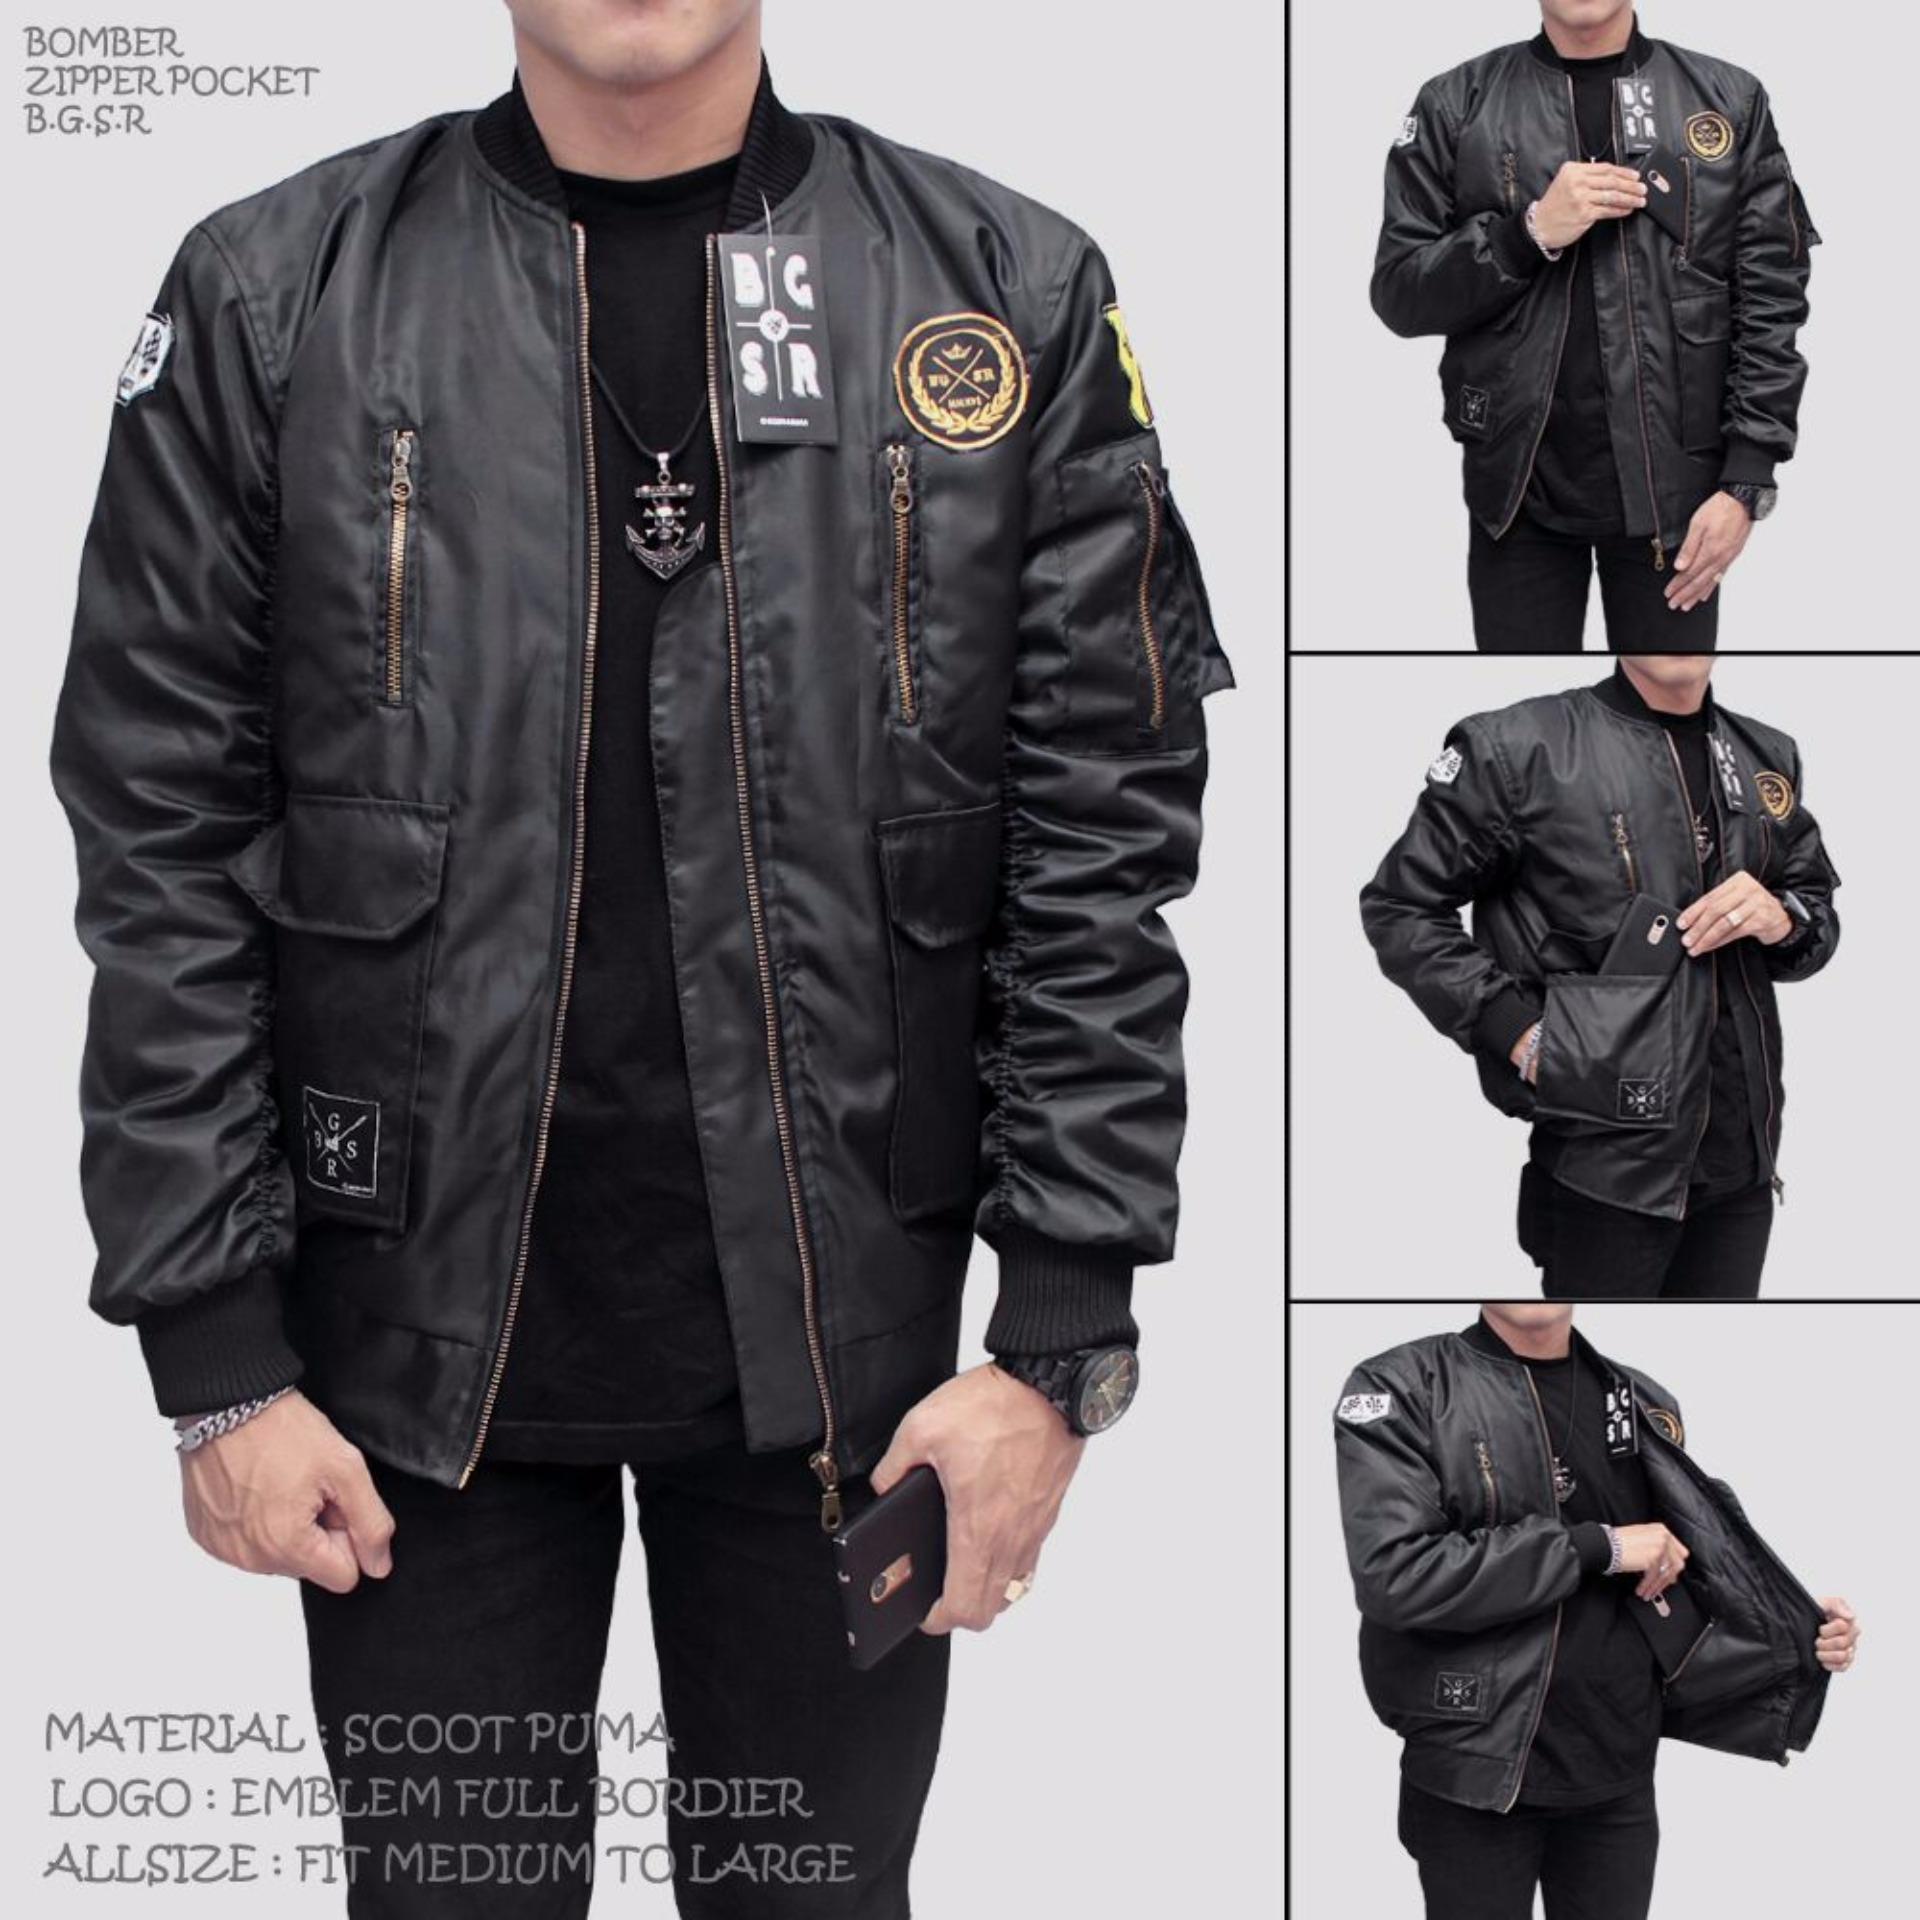 Toko Bgsr Bomber Pocket Zipper Black Bgsr Di Jawa Barat